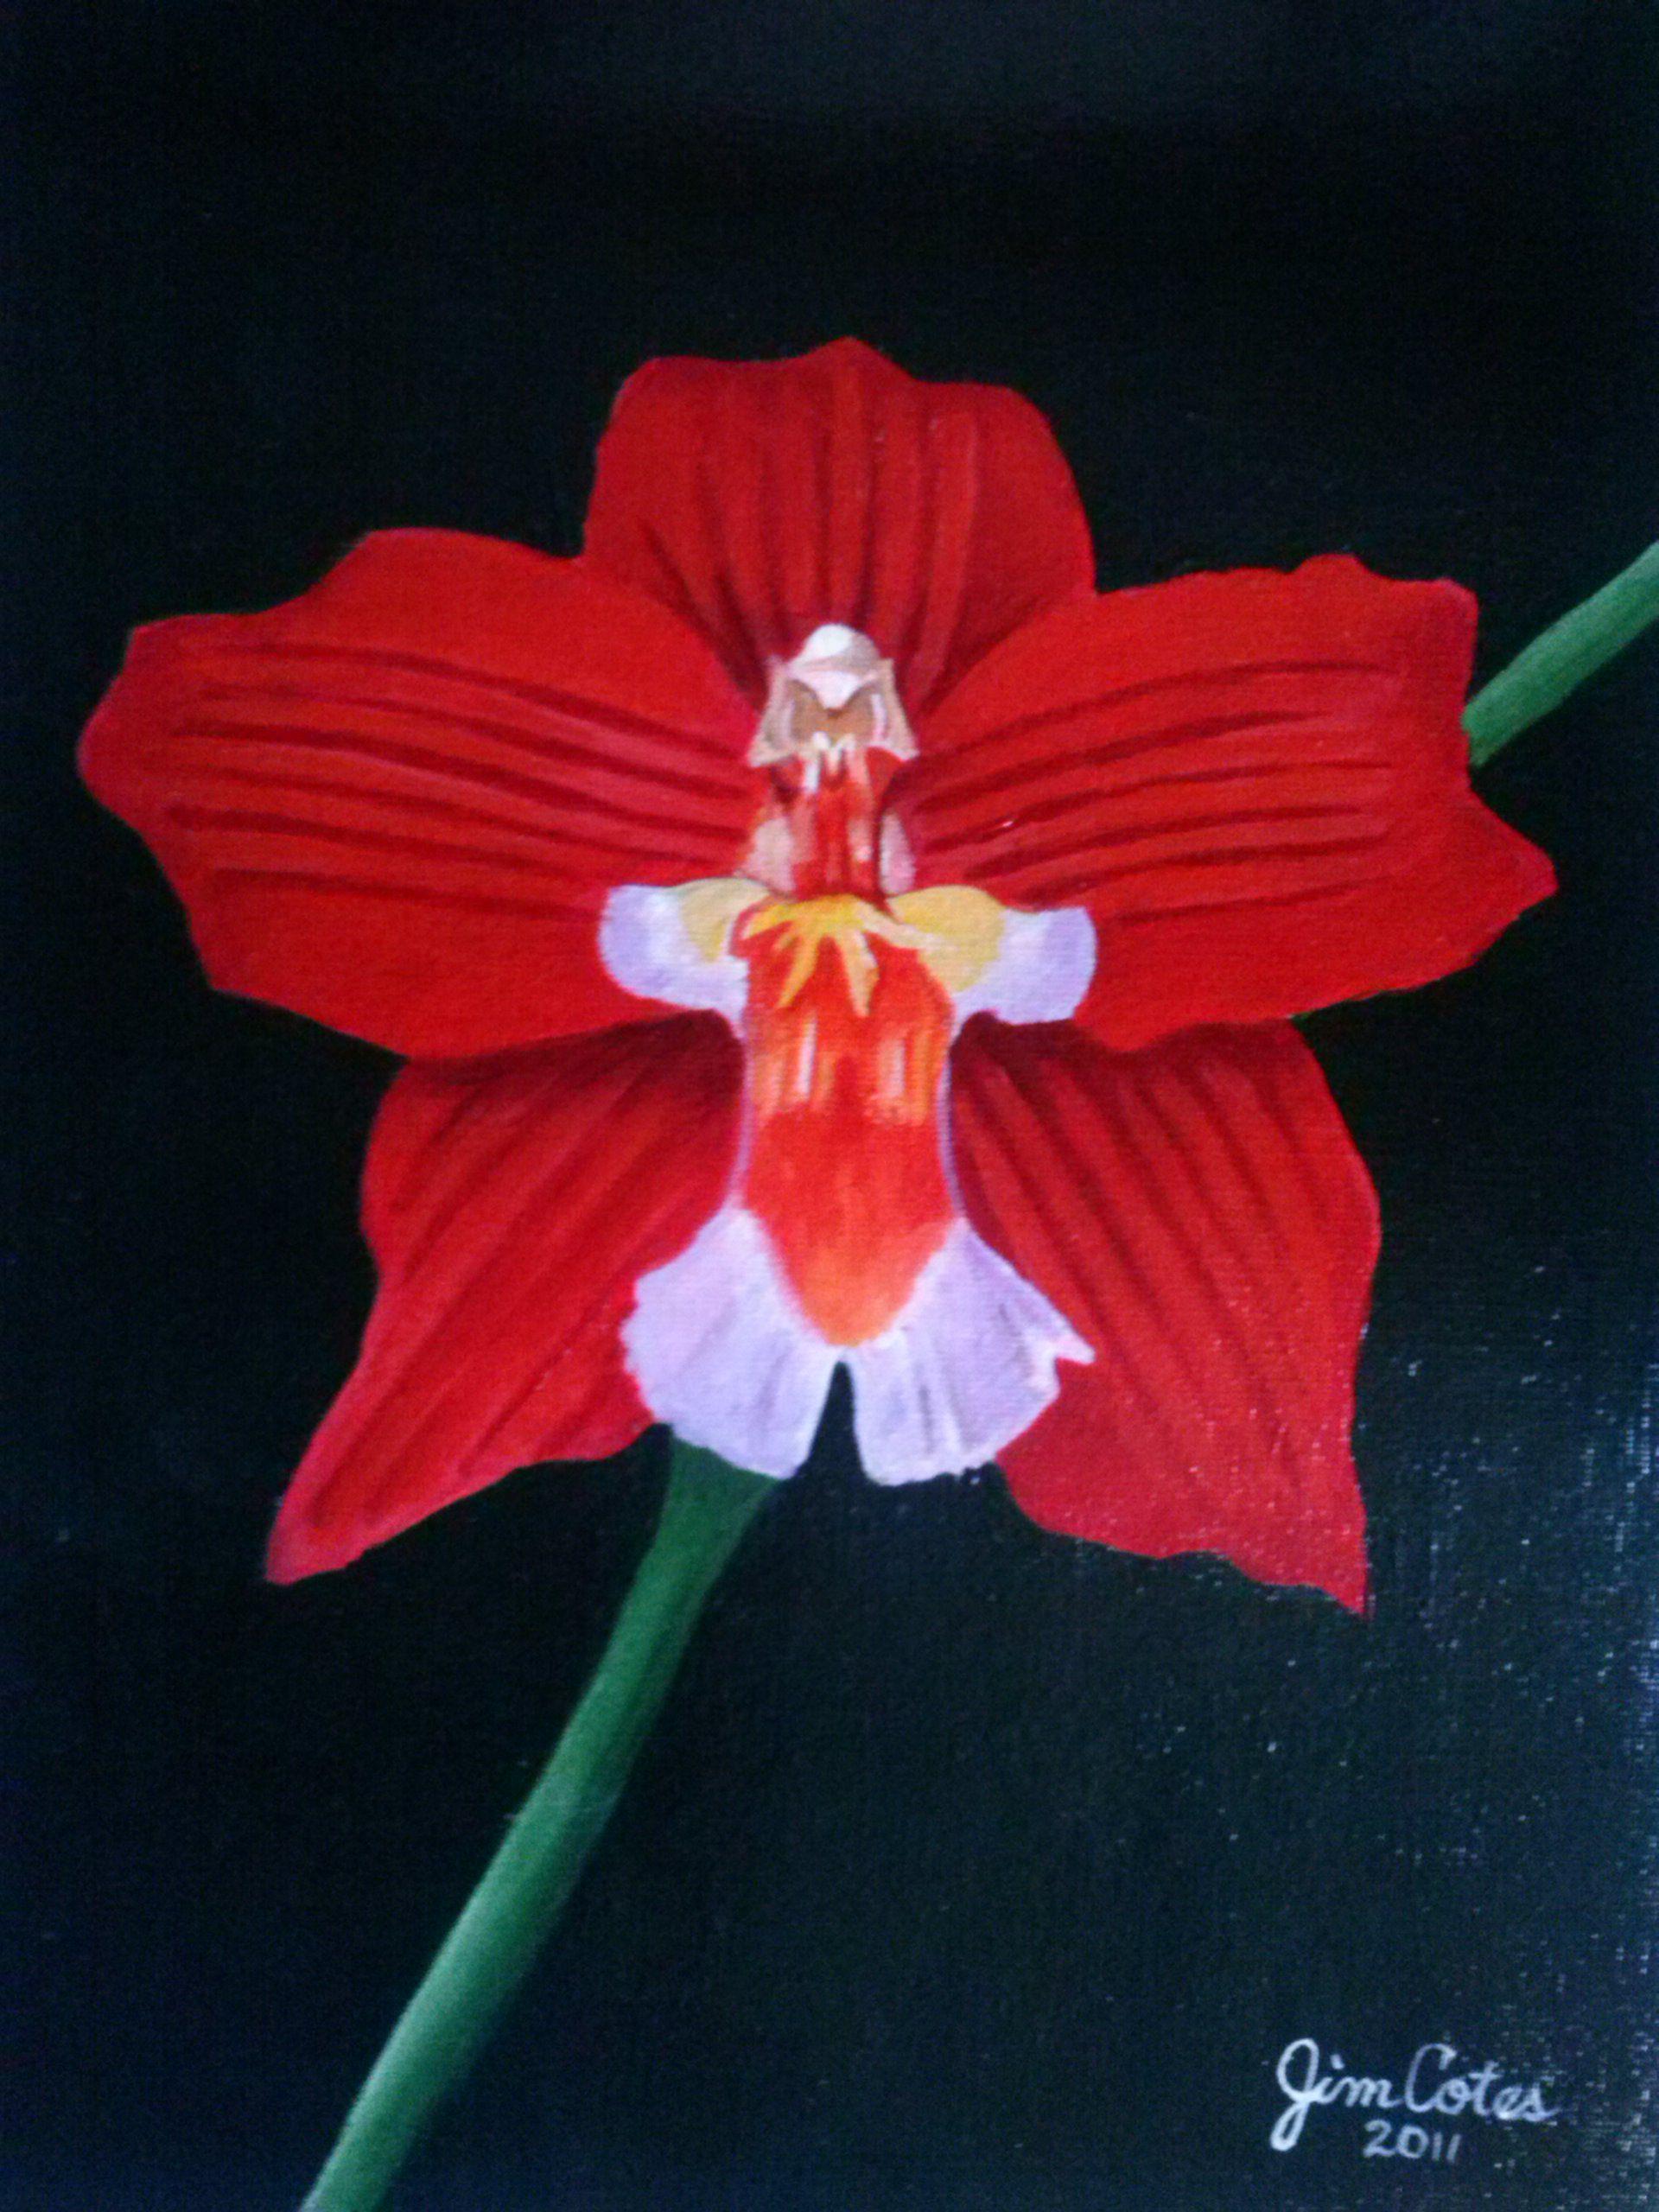 120 Orquideas Acrílico Sobre Lienzo Orquideas Lienzos Espíritu Santo Dibujos